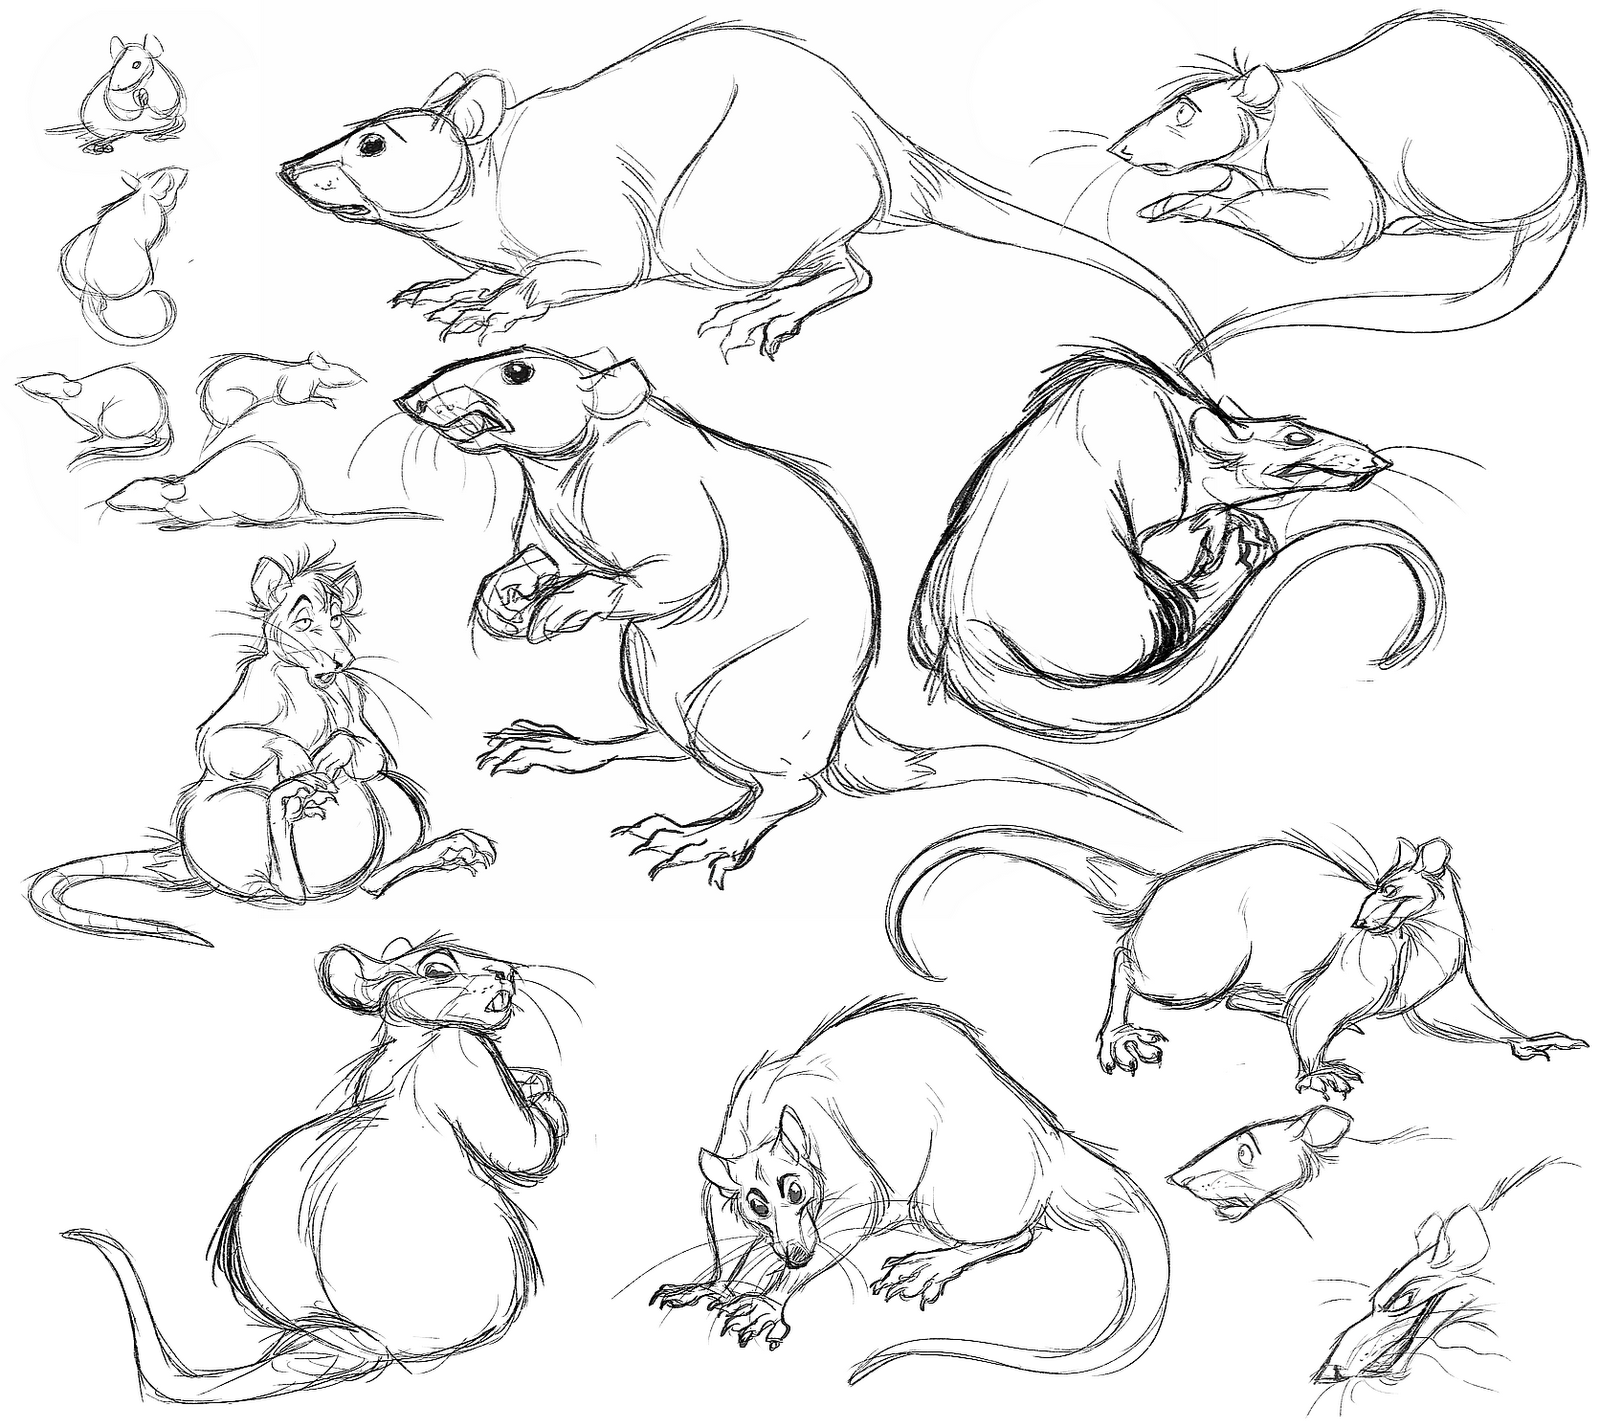 Drawn rat sketch Emone drawing drawing rats Emone